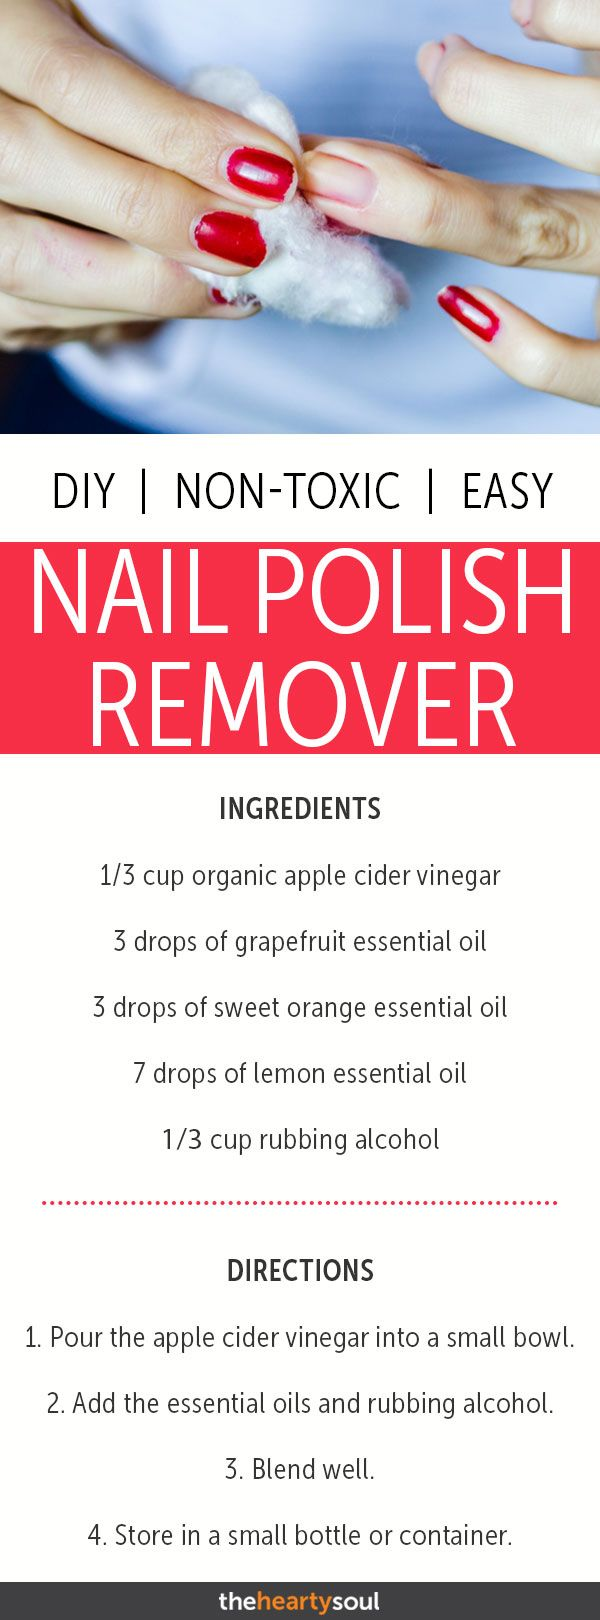 How to Make Non-Toxic Nail Polish Remover with Grapefruit, Orange, and Lemon Oils